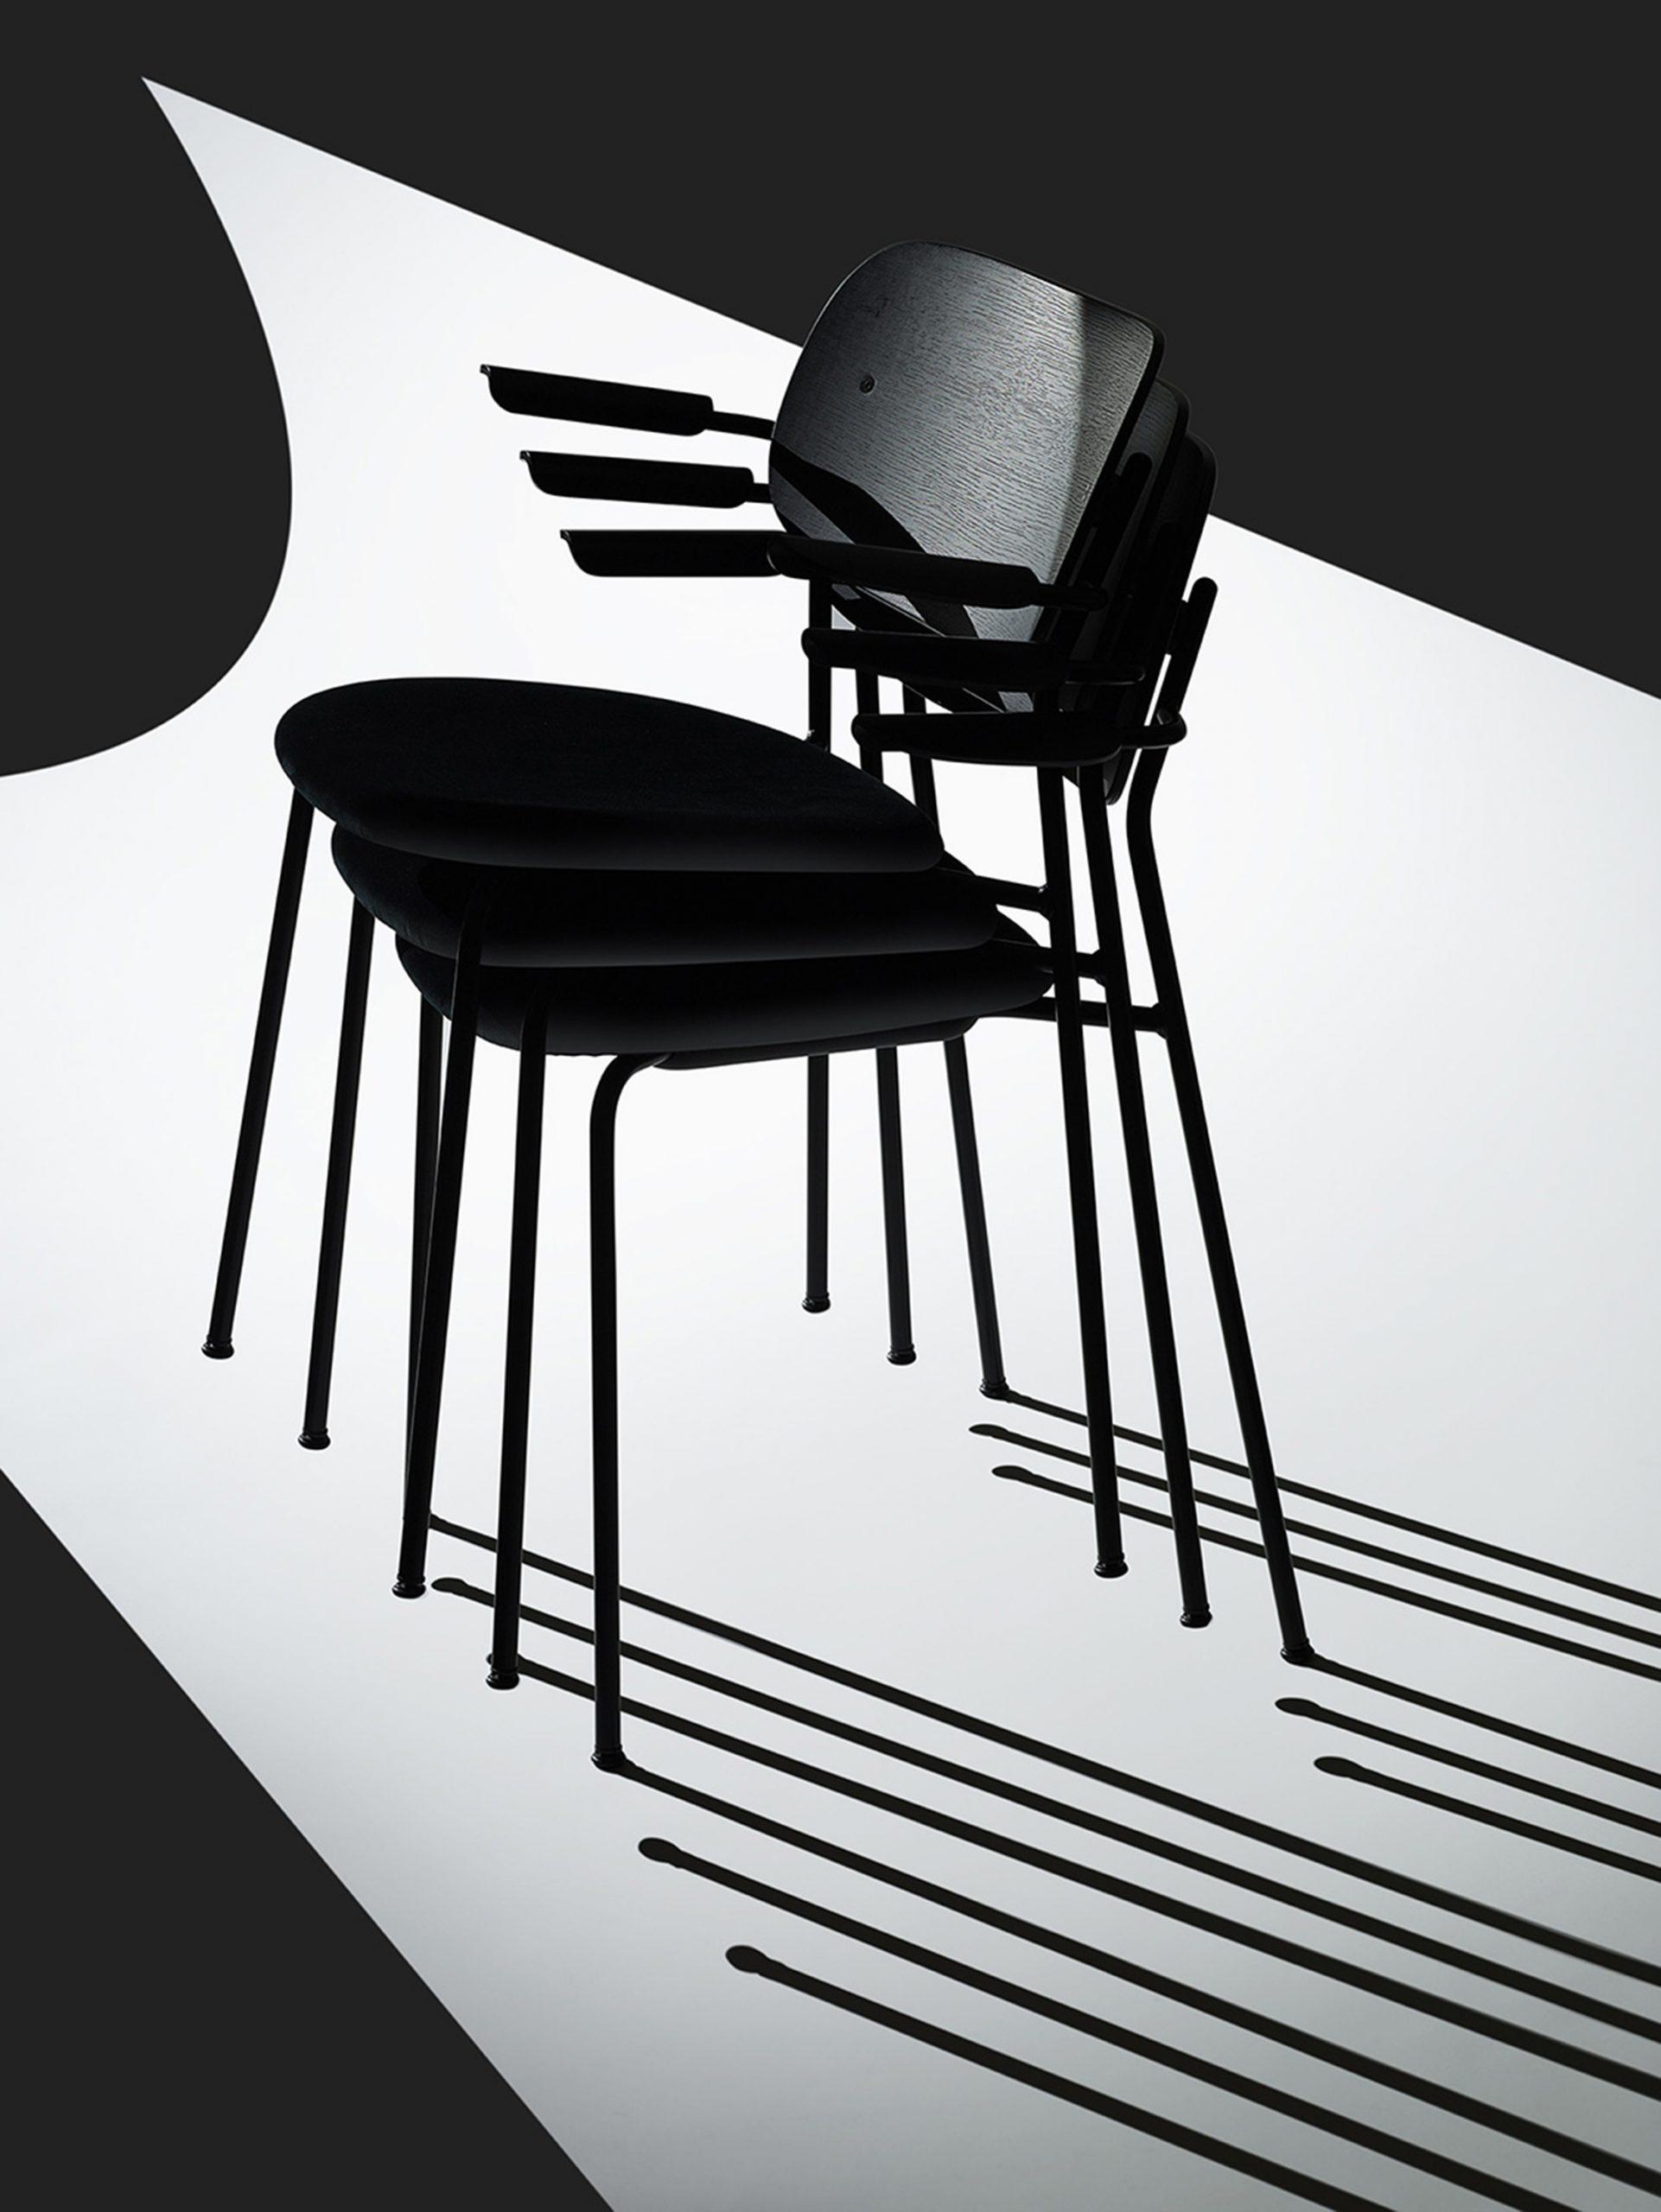 Wren-Agency-Richard-Foster-Overview-34